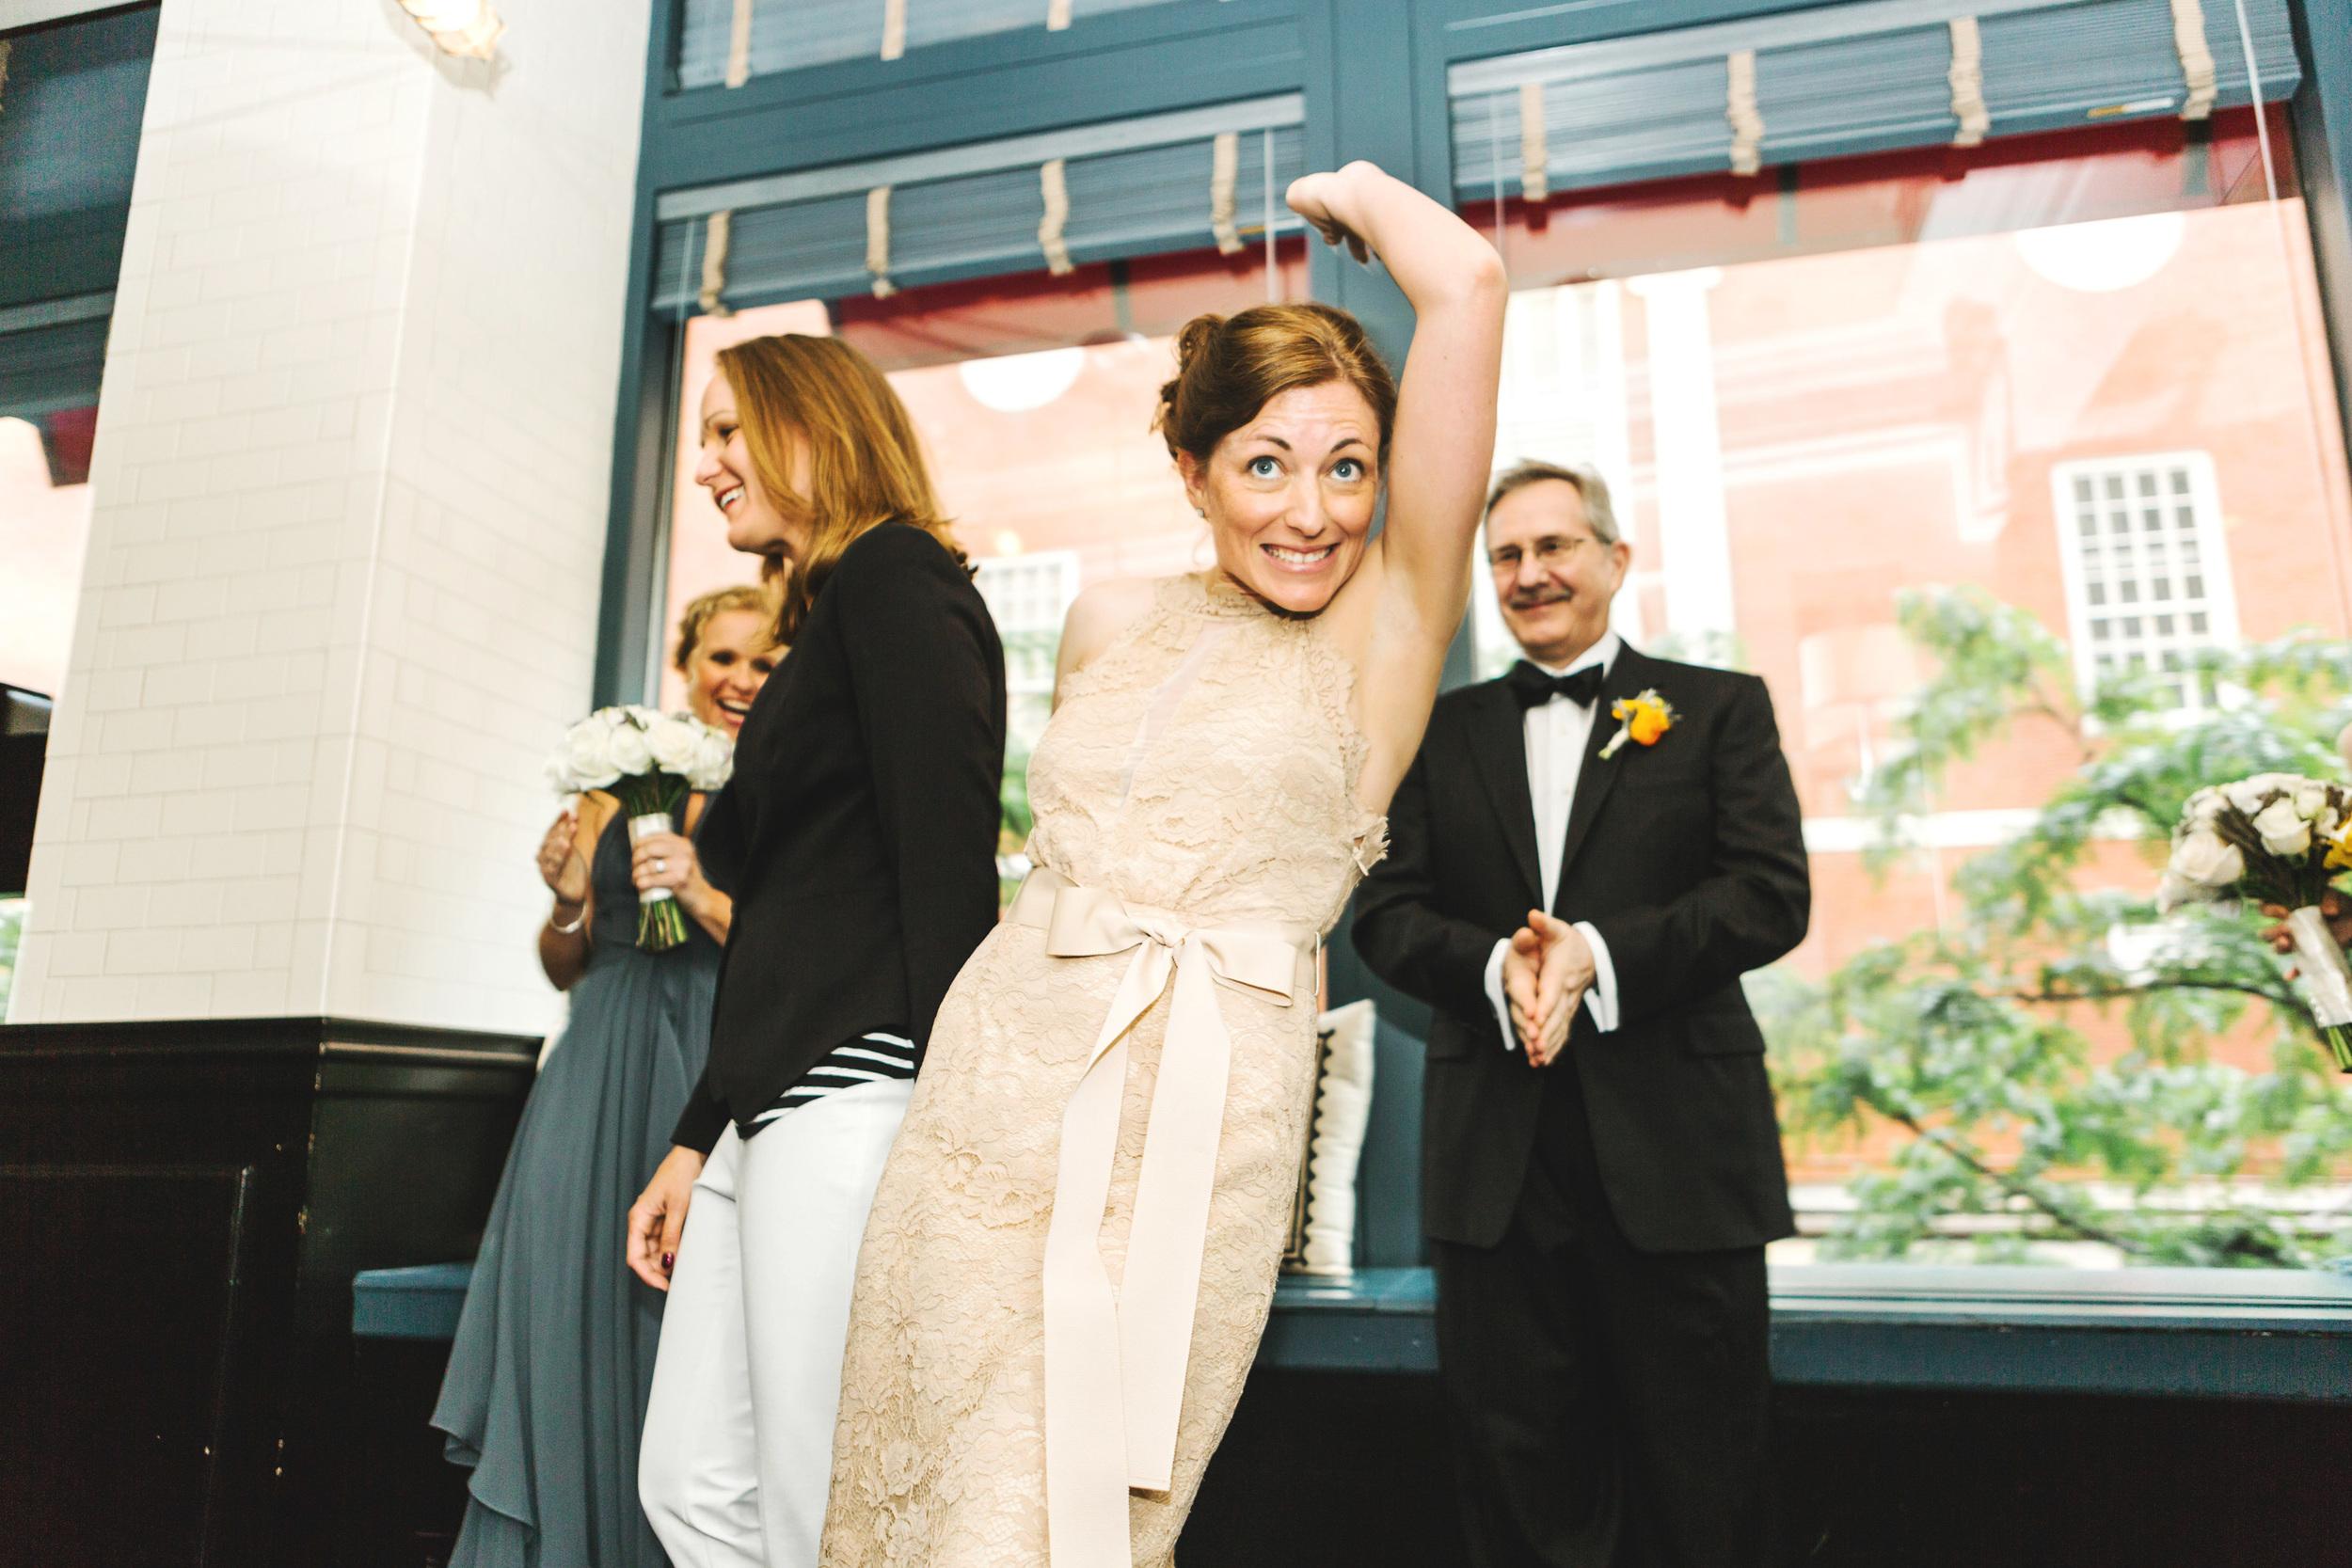 Boston_Wedding_Photographer_Lena_Mirisola-55.jpg